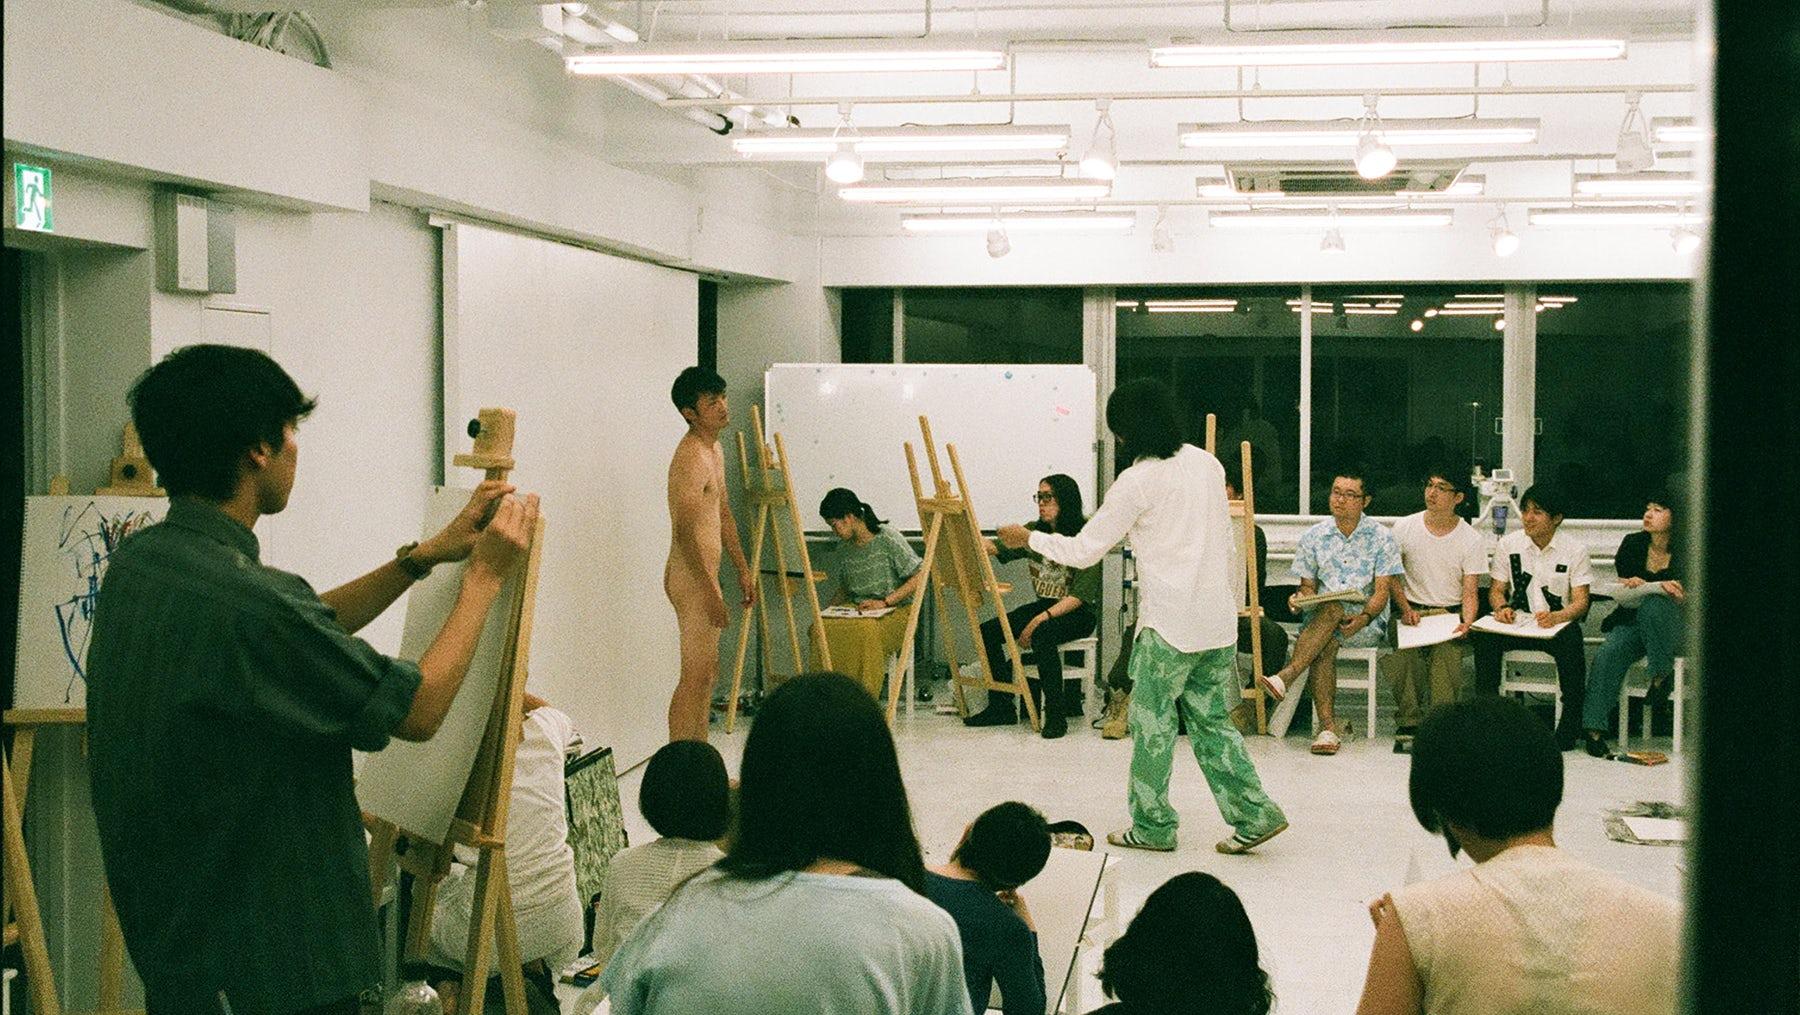 Nude life drawing classes at Coconogacco in Tokyo | Photo: Chikashi Suzuki